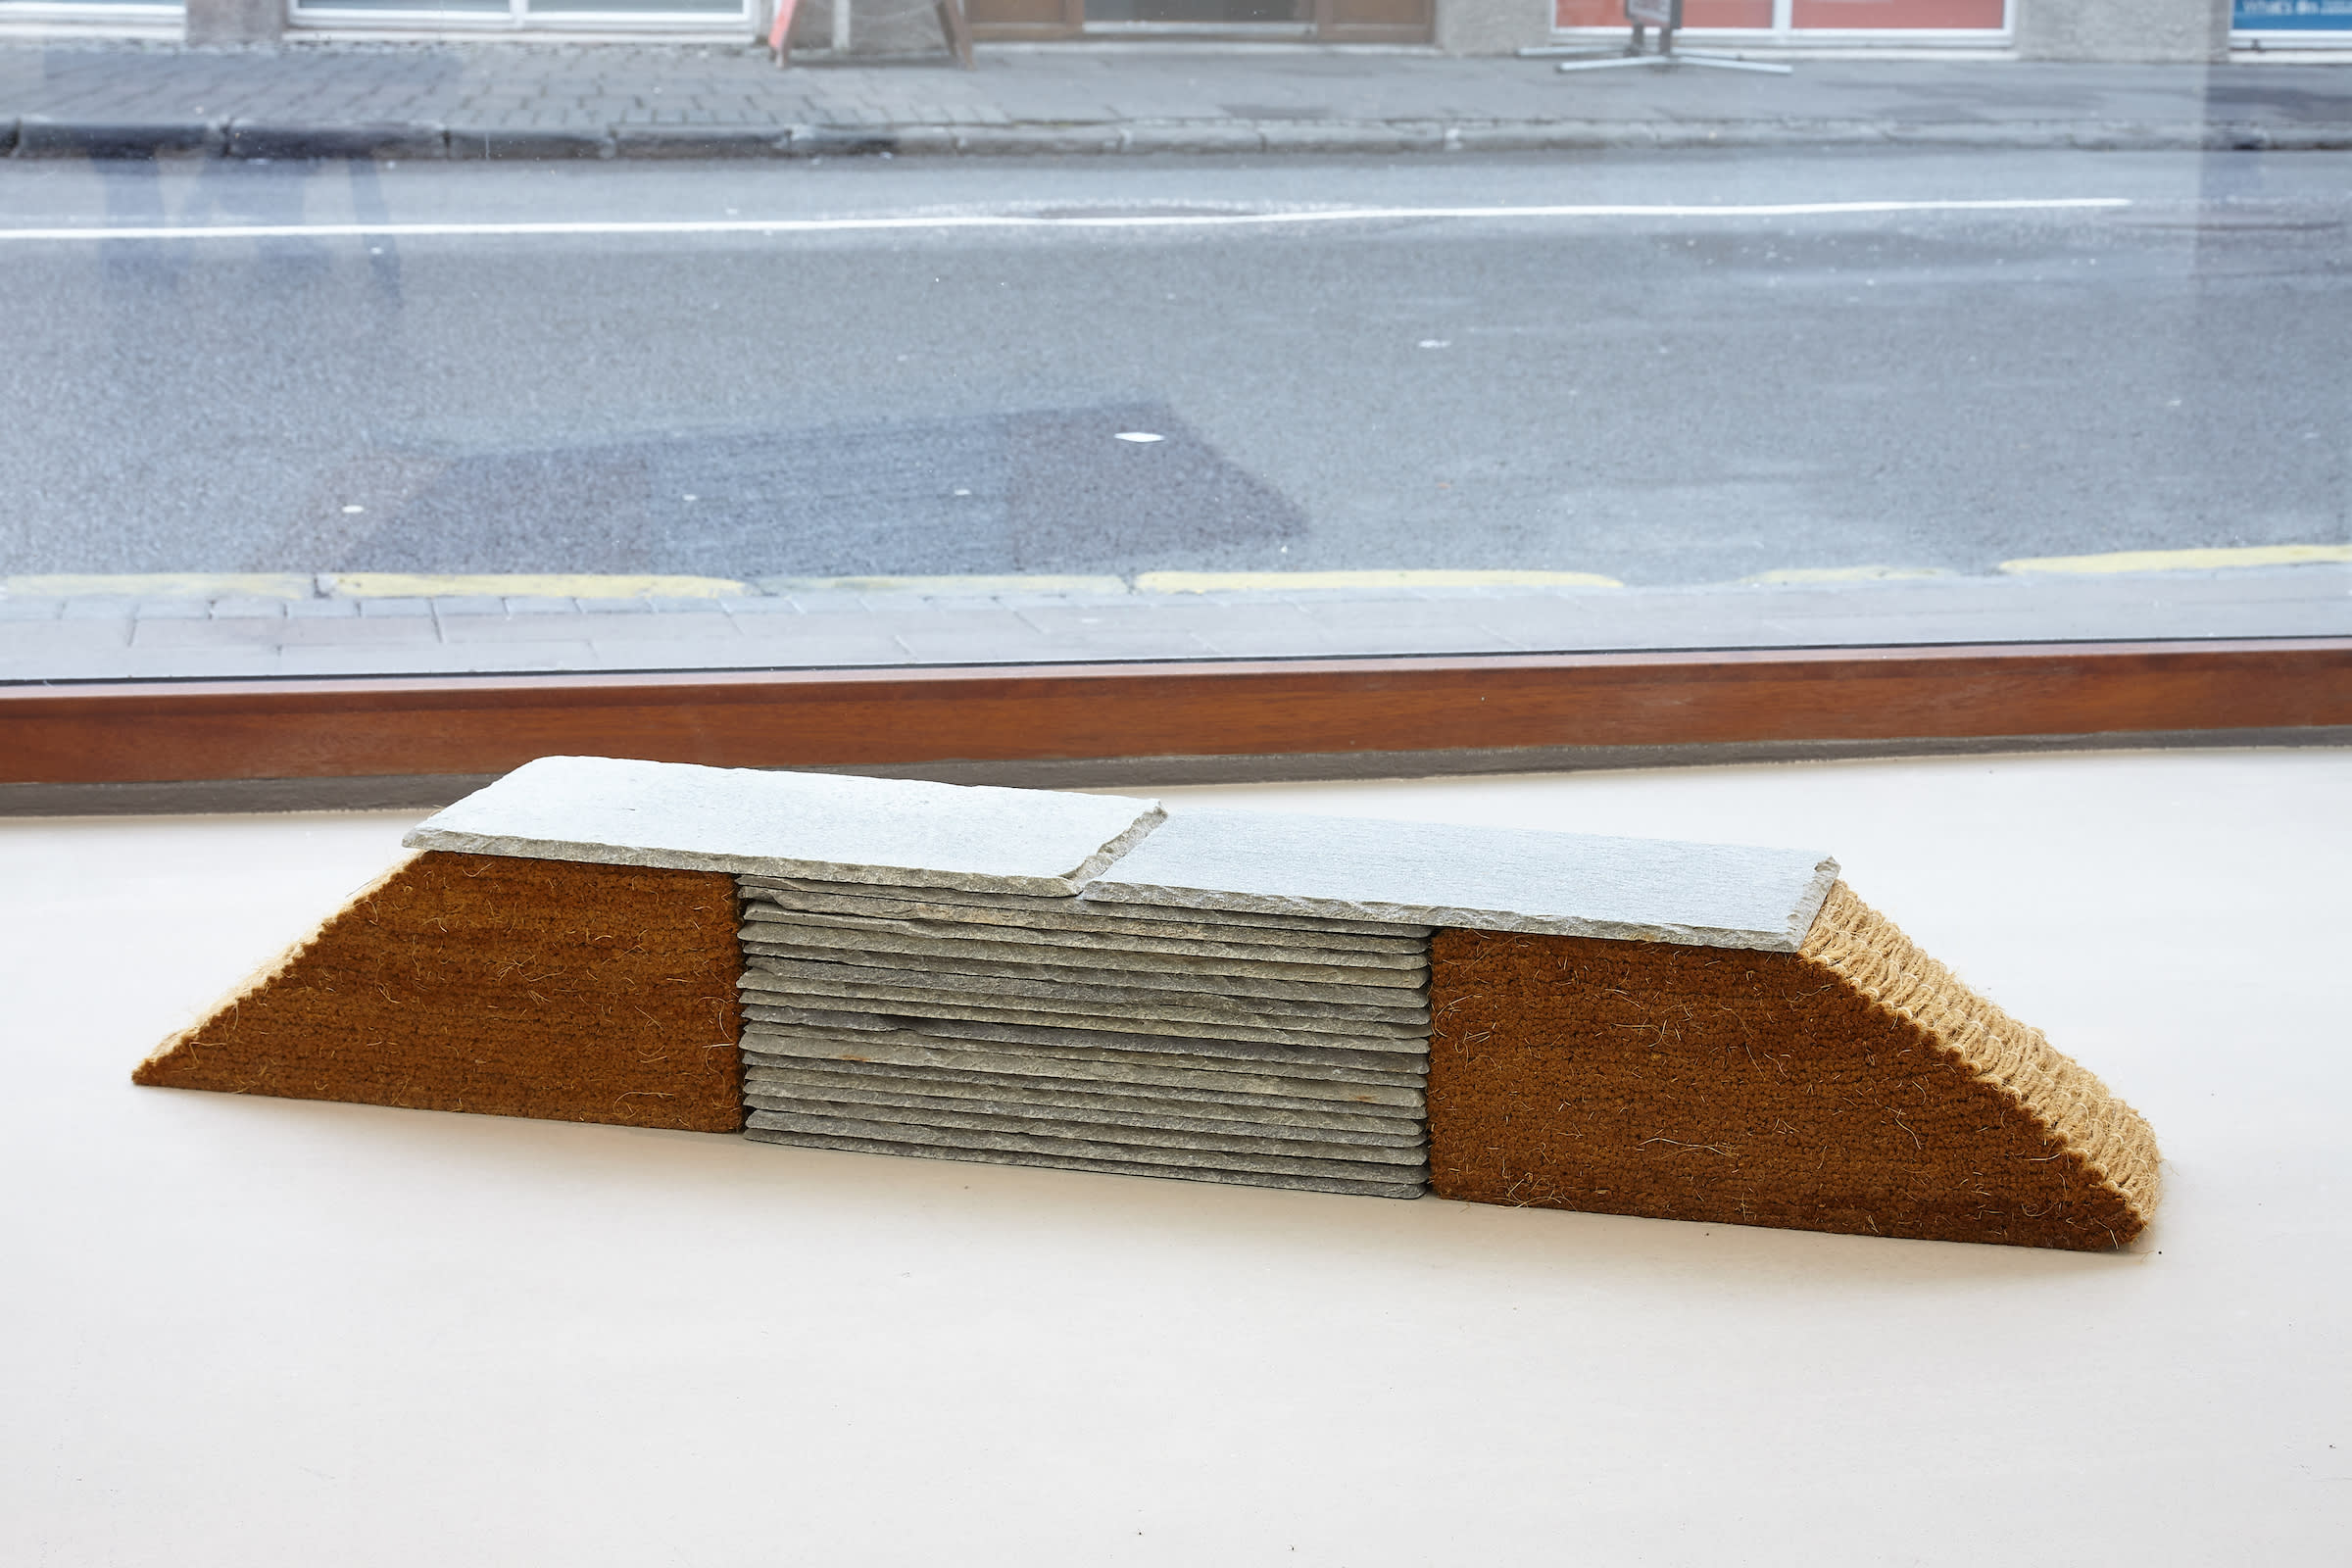 "<span class=""link fancybox-details-link""><a href=""/exhibitions/171/works/artworks10556/"">View Detail Page</a></span><div class=""artist""><strong>RAGNA RÓBERTSDÓTTIR</strong></div><div class=""title""><em>Untitled</em>, 1986</div><div class=""medium"">manilla rope, linen, slates</div><div class=""dimensions"">20 x 123 x 20 cm</div>"